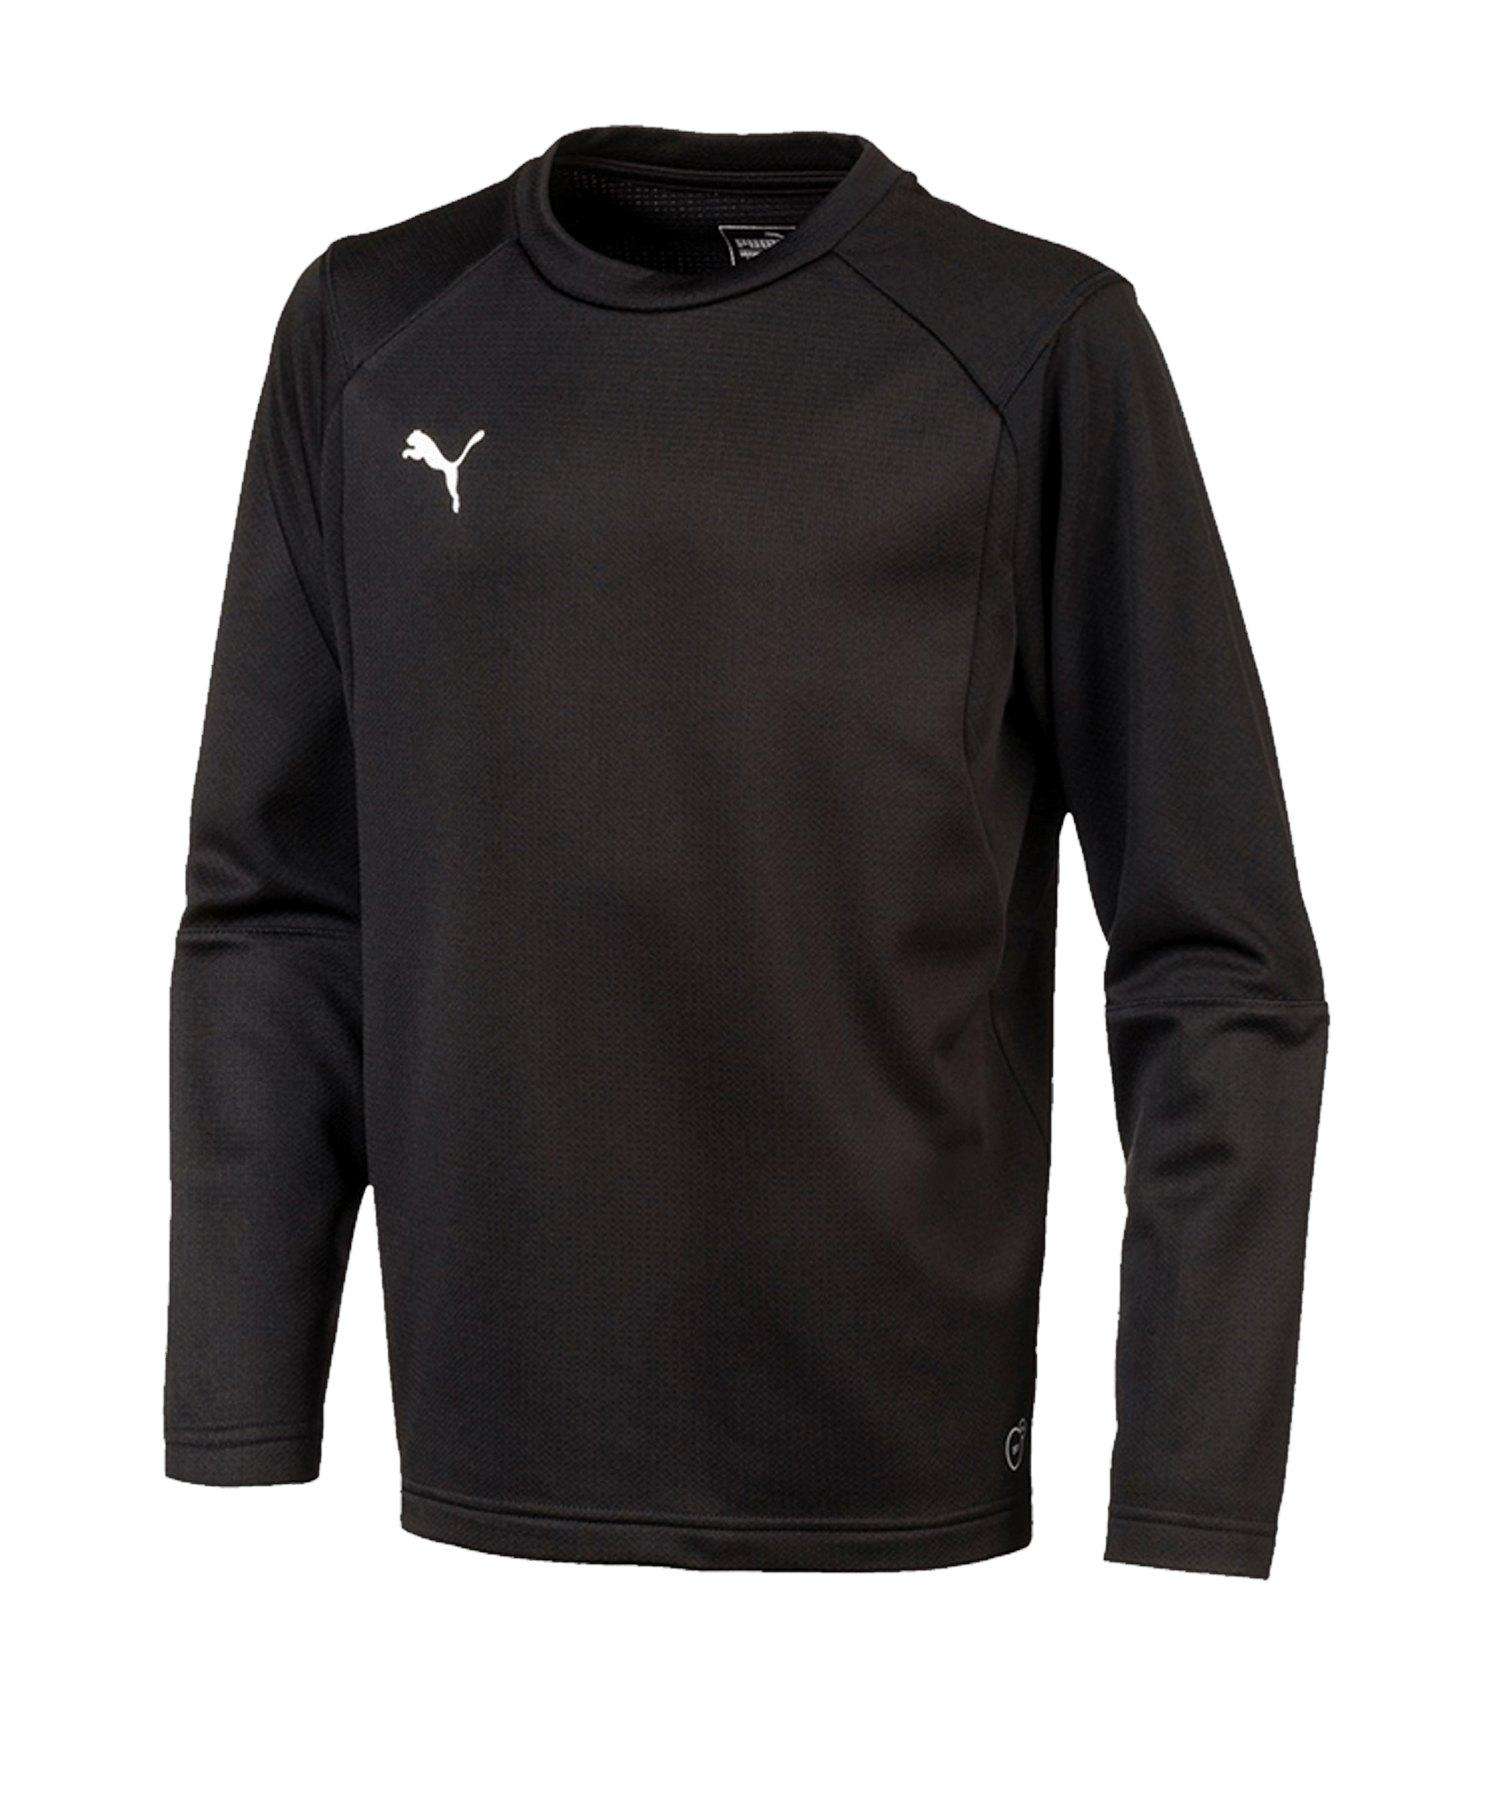 PUMA LIGA Training Sweatshirt Kids Schwarz F03 - schwarz